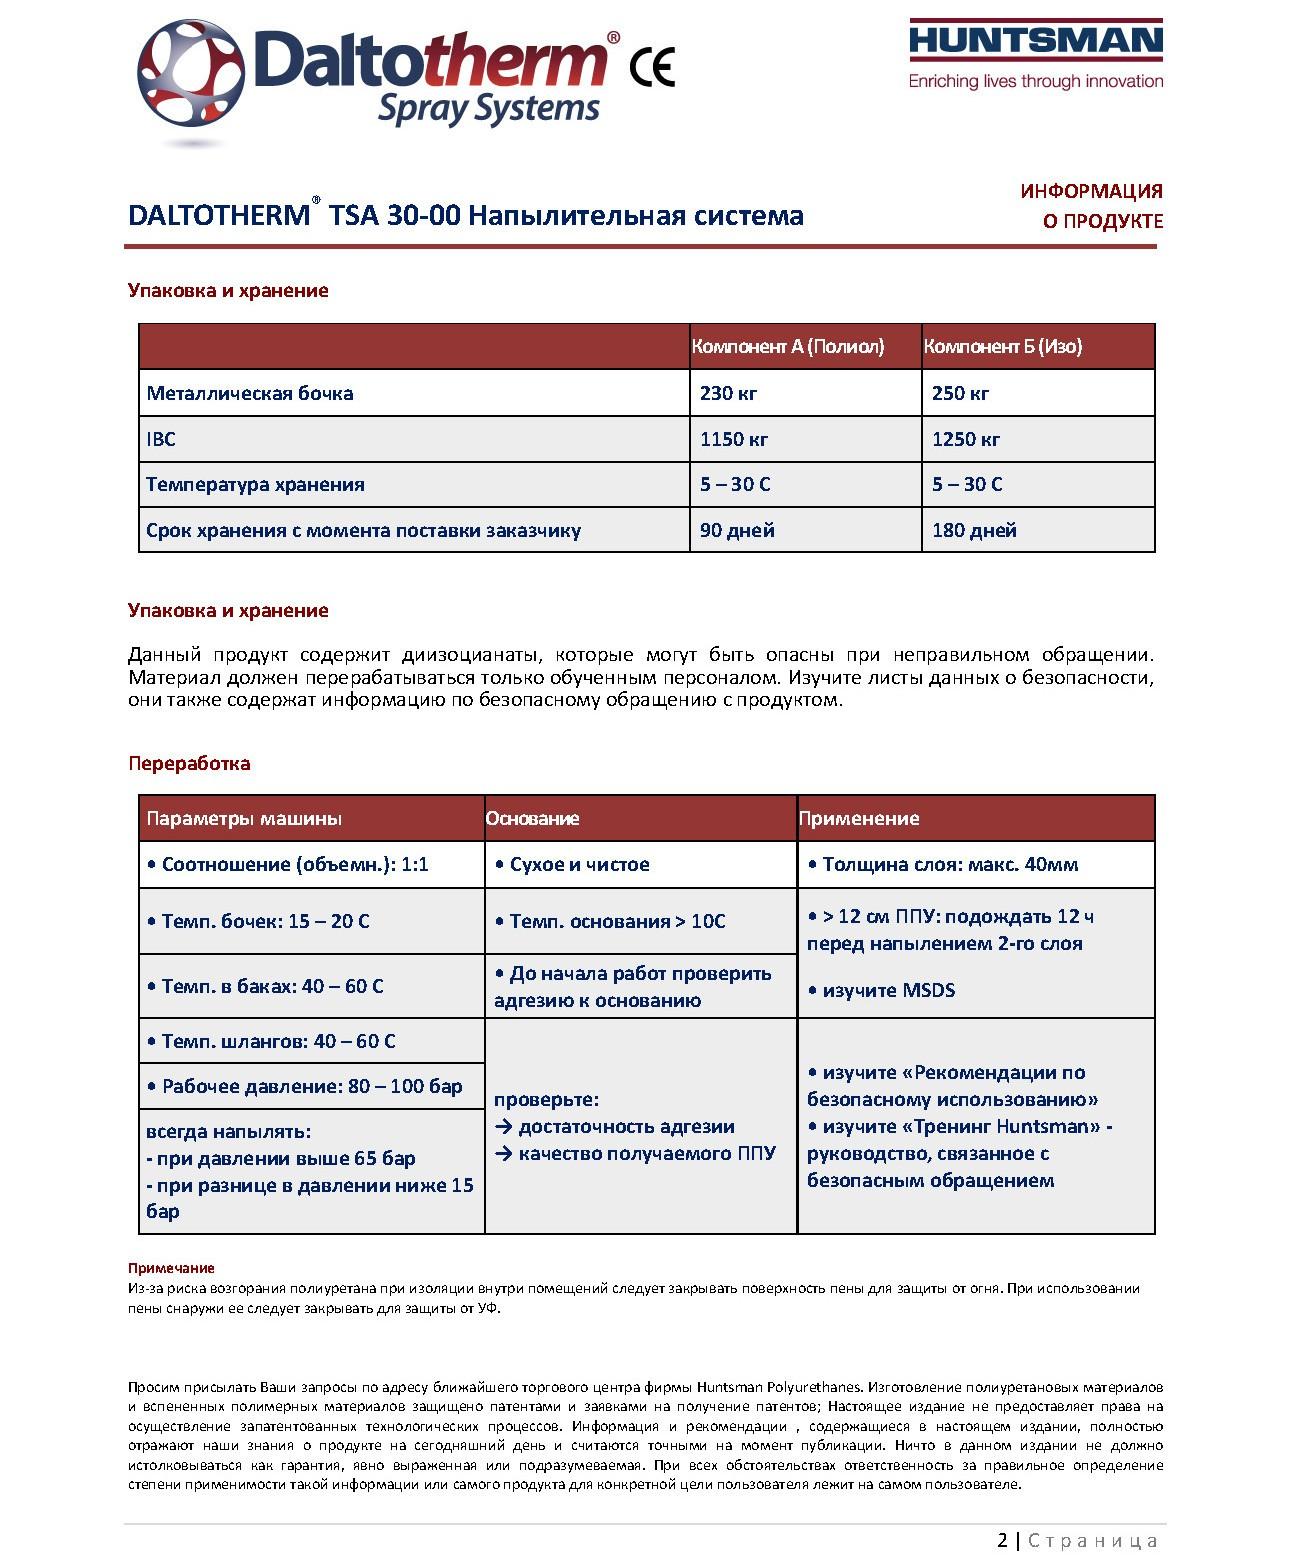 Daltotherm_TSA_30-00 компоненты Huntsman NMG Ханстман _Страница_2